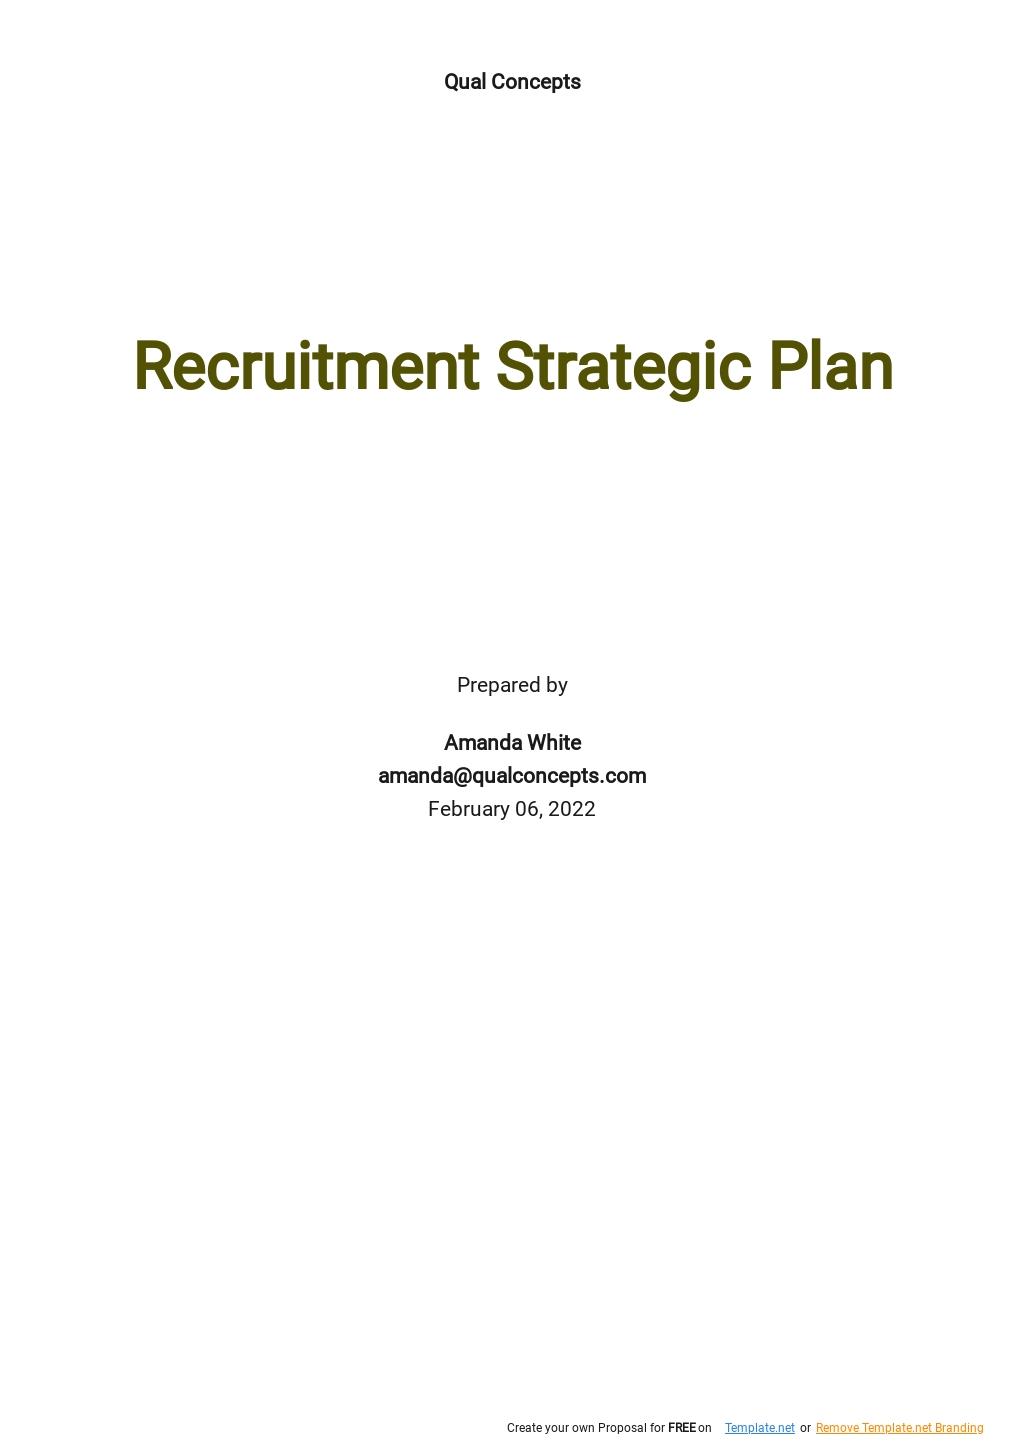 Recruitment Strategic Plan Template.jpe